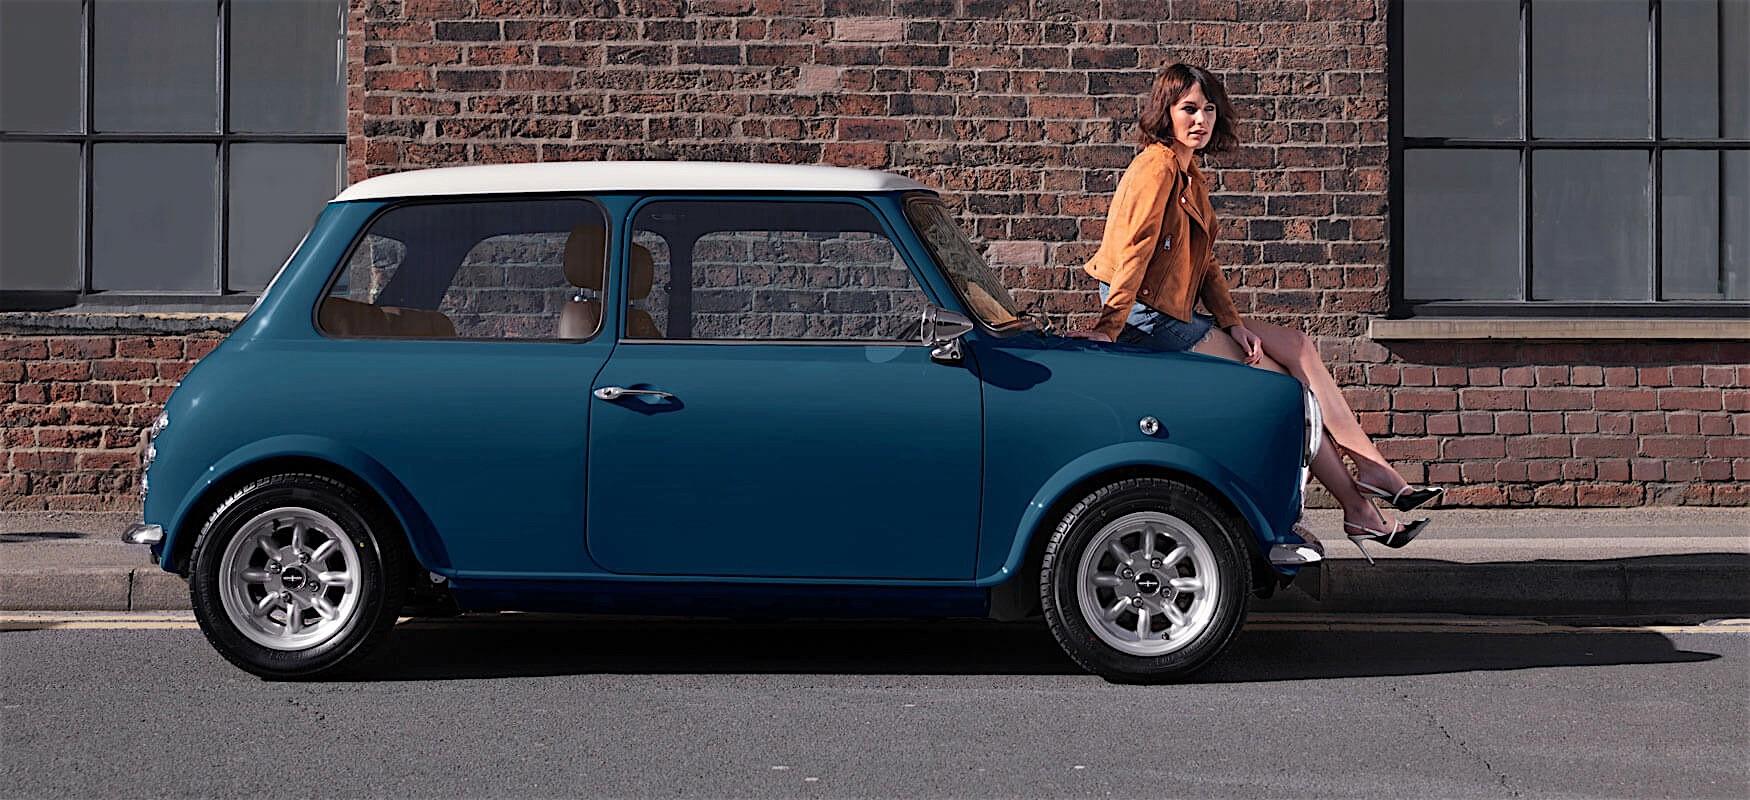 David Brown Automotive Remasters The Classic Mini Keyless